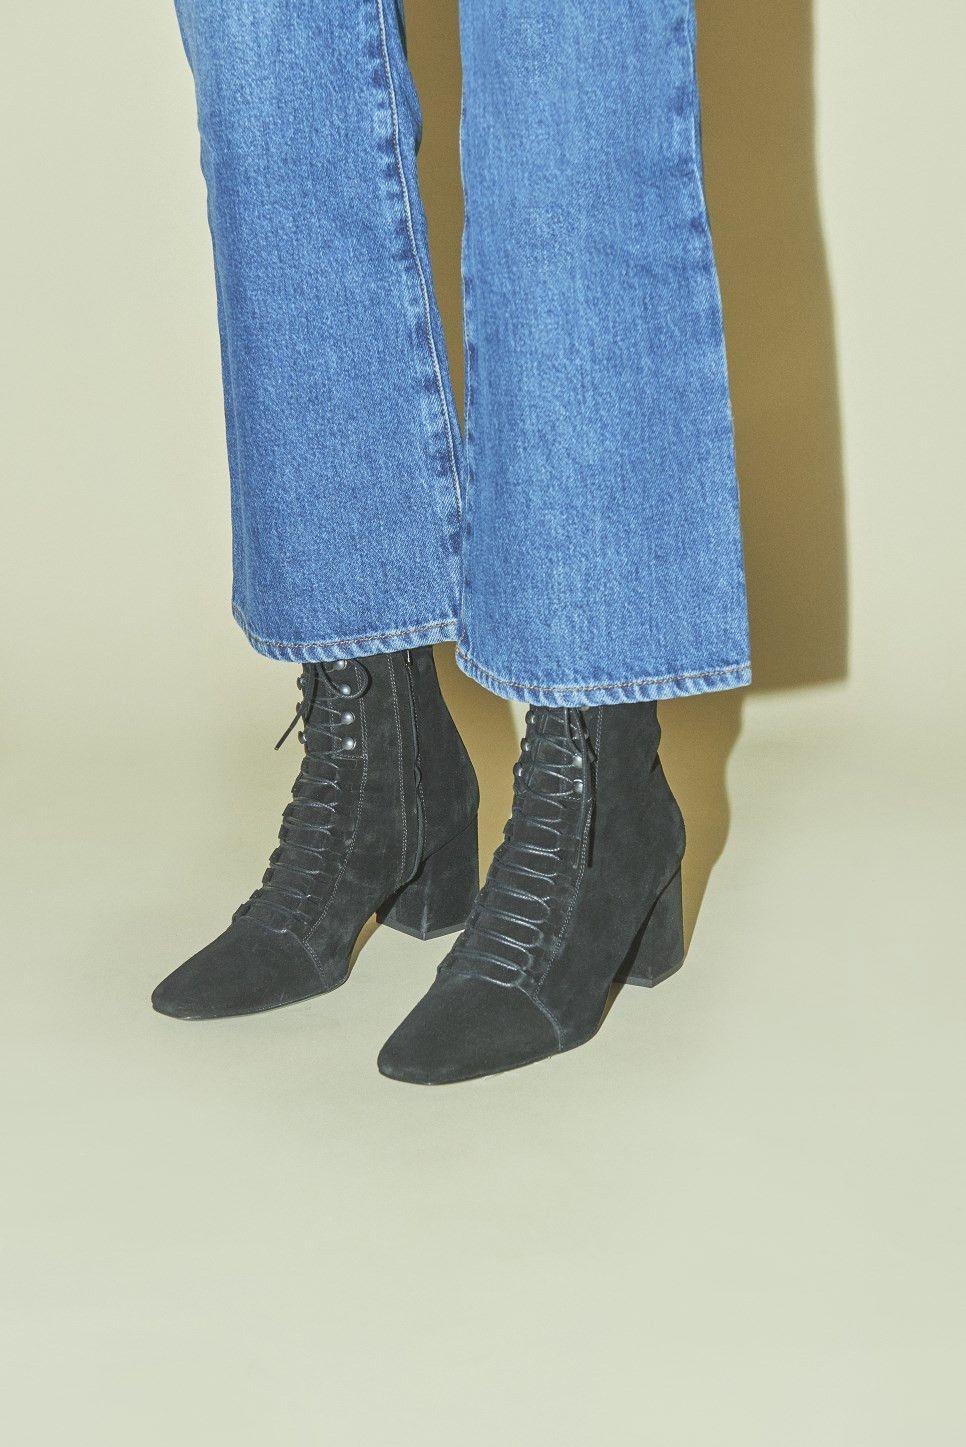 b33de4d72e2 $285, Rouje, Josephine Boots - Size 38 (US 7) | w e a r in 2019 ...